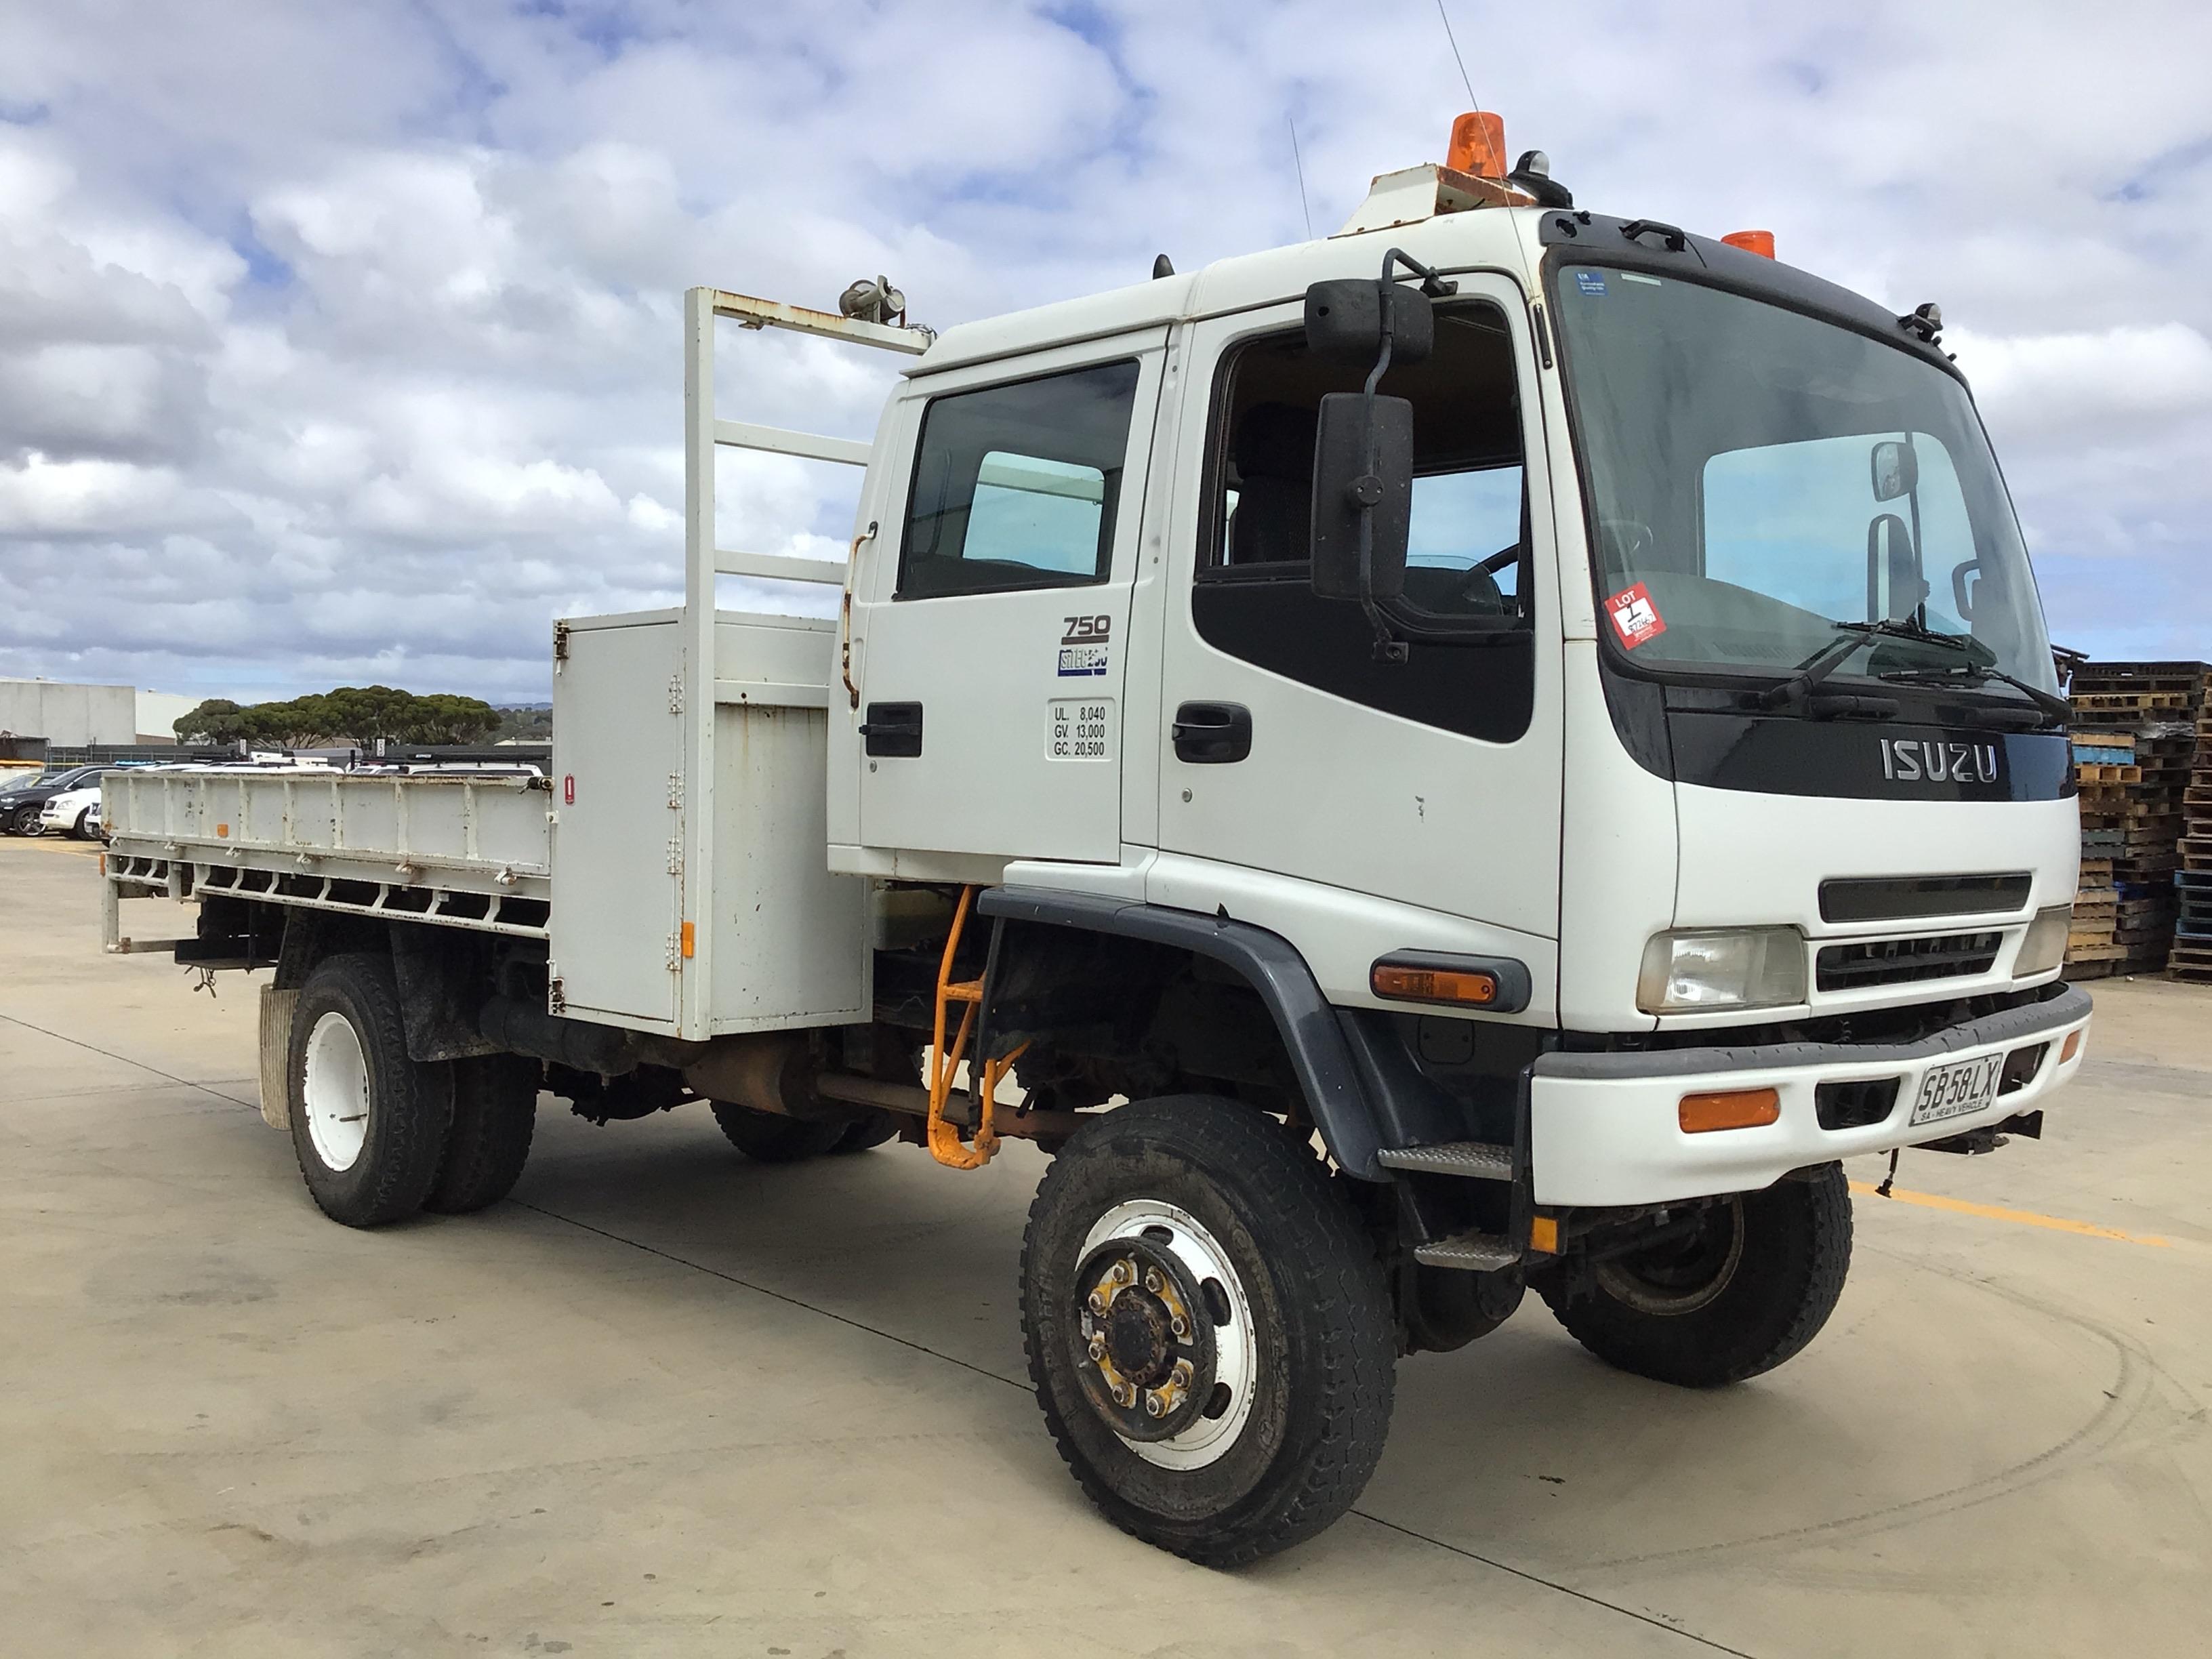 2002 Isuzu FTS 750 4 x 4 Crew Cab Chassis Truck